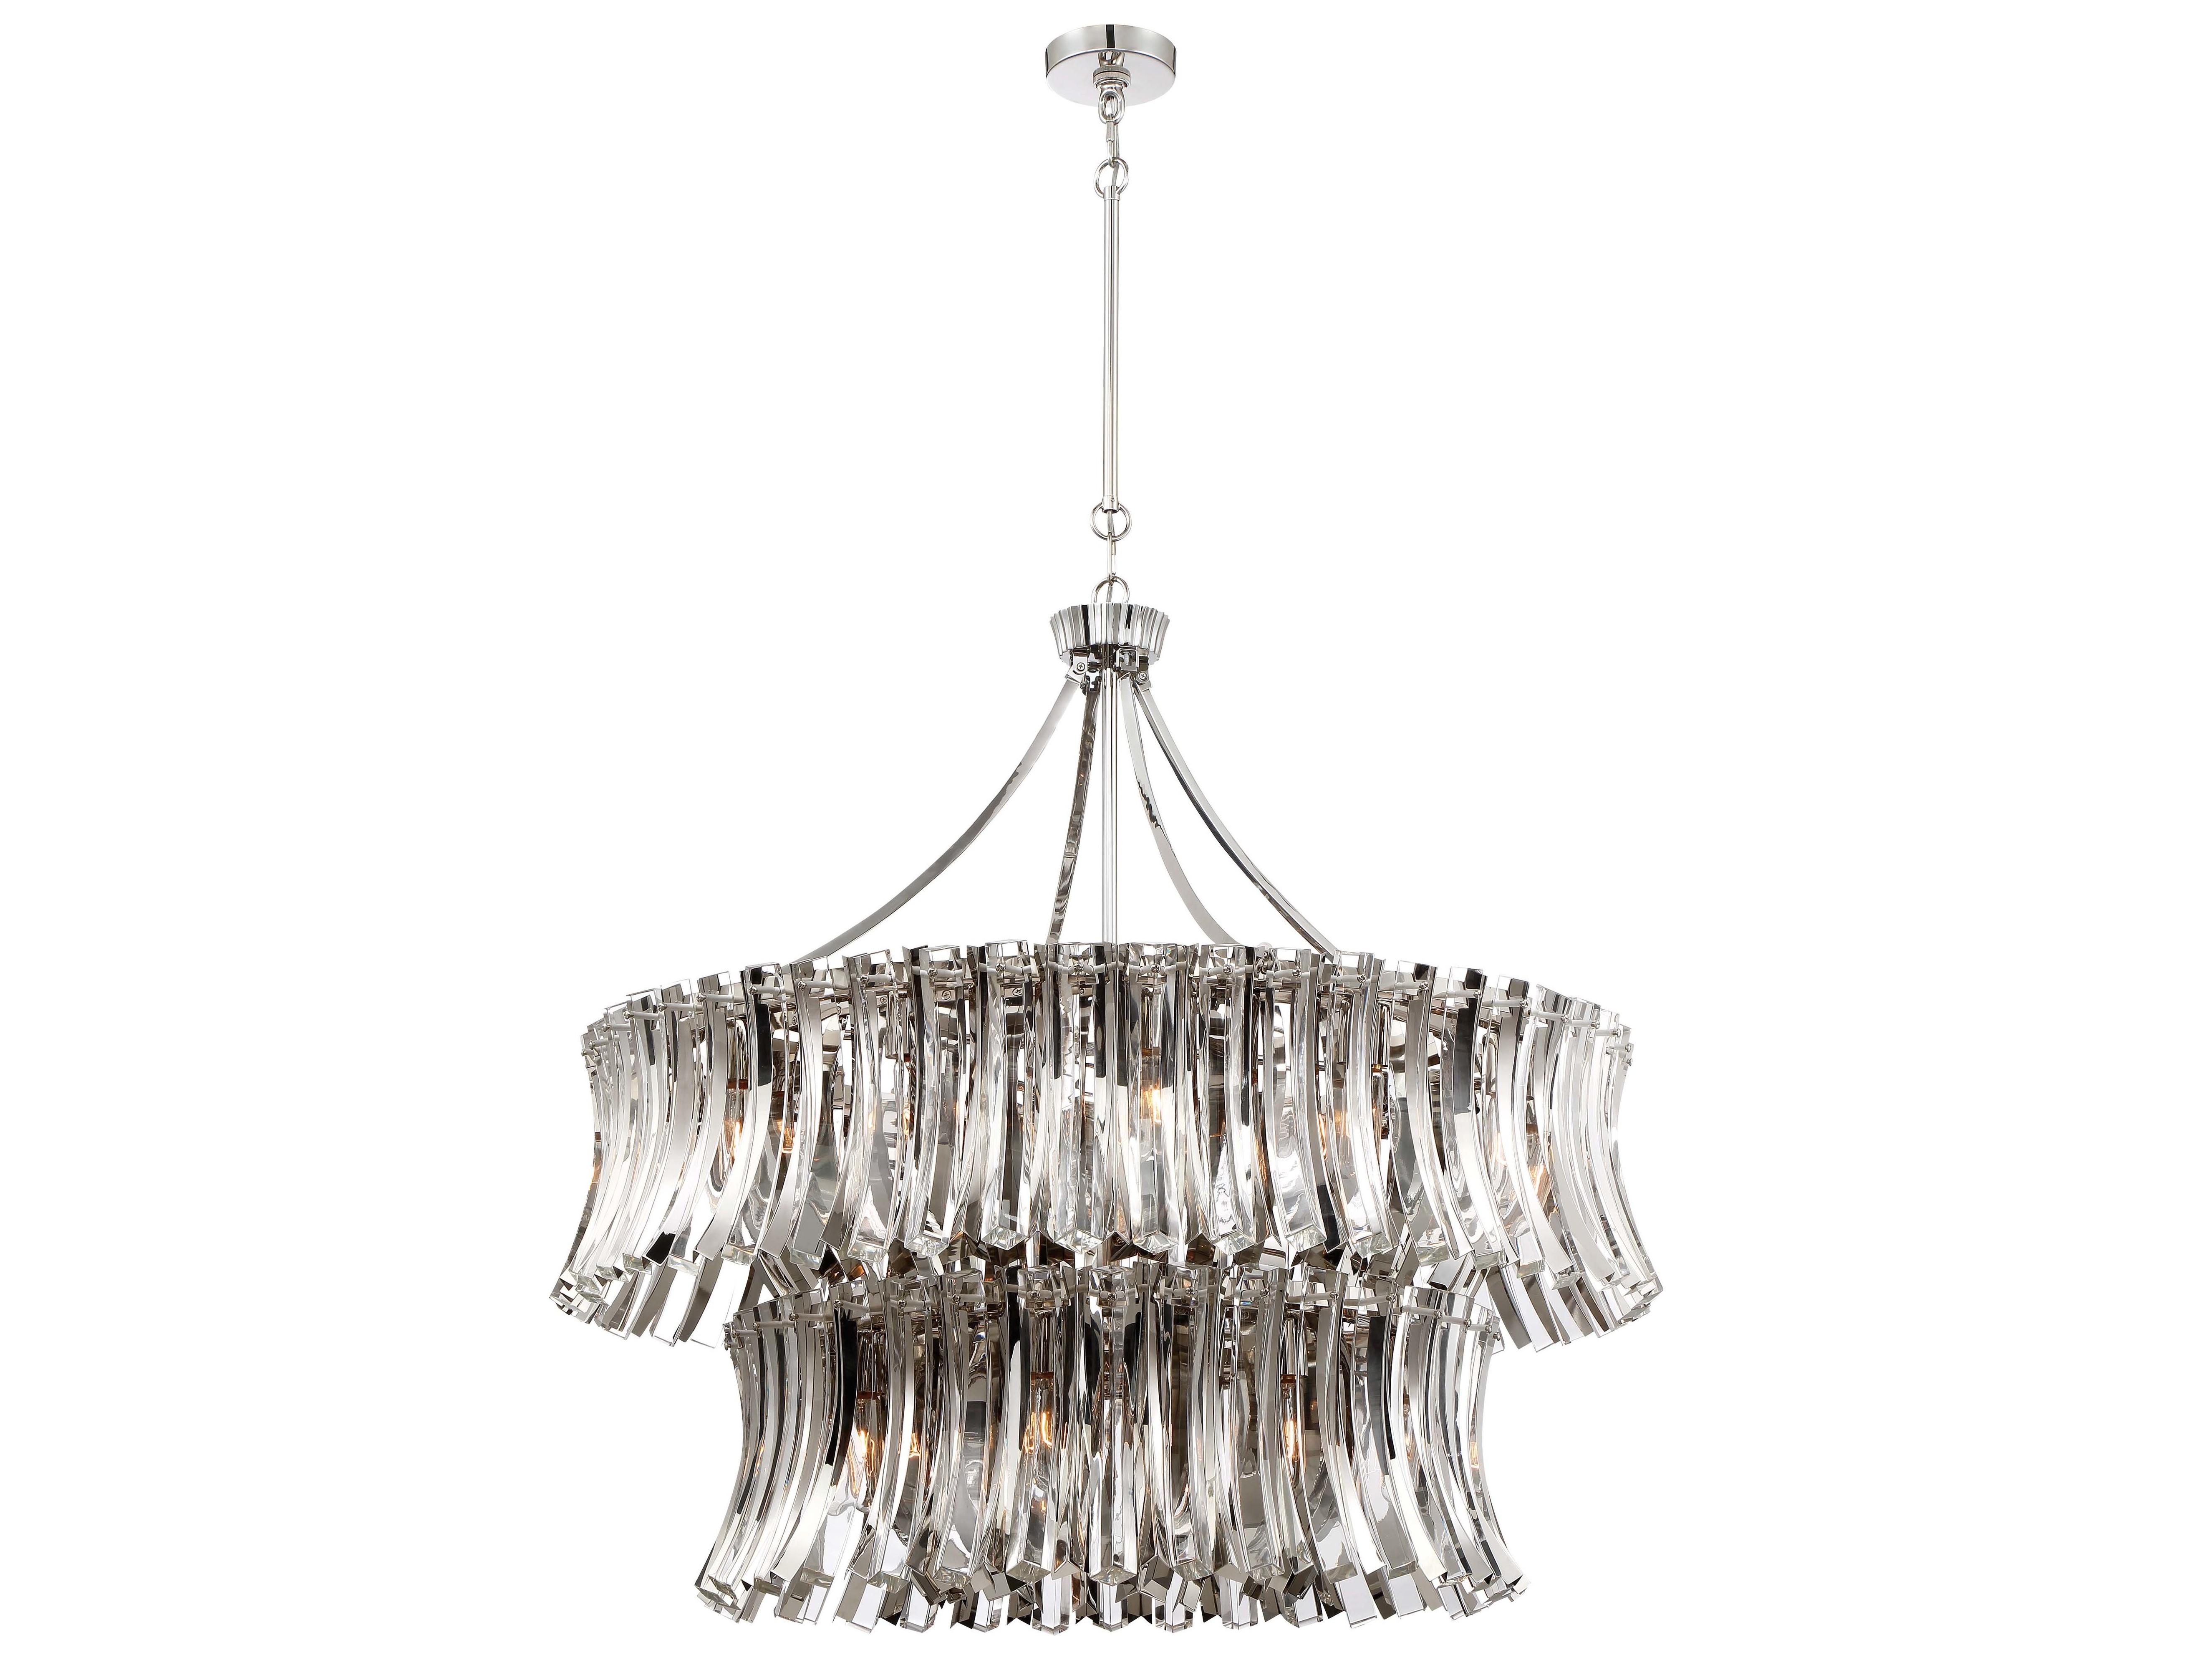 Metropolitan Lighting Elegance Royale Polished Nickel 39 Wide Crystal Gl Medium Chandelier